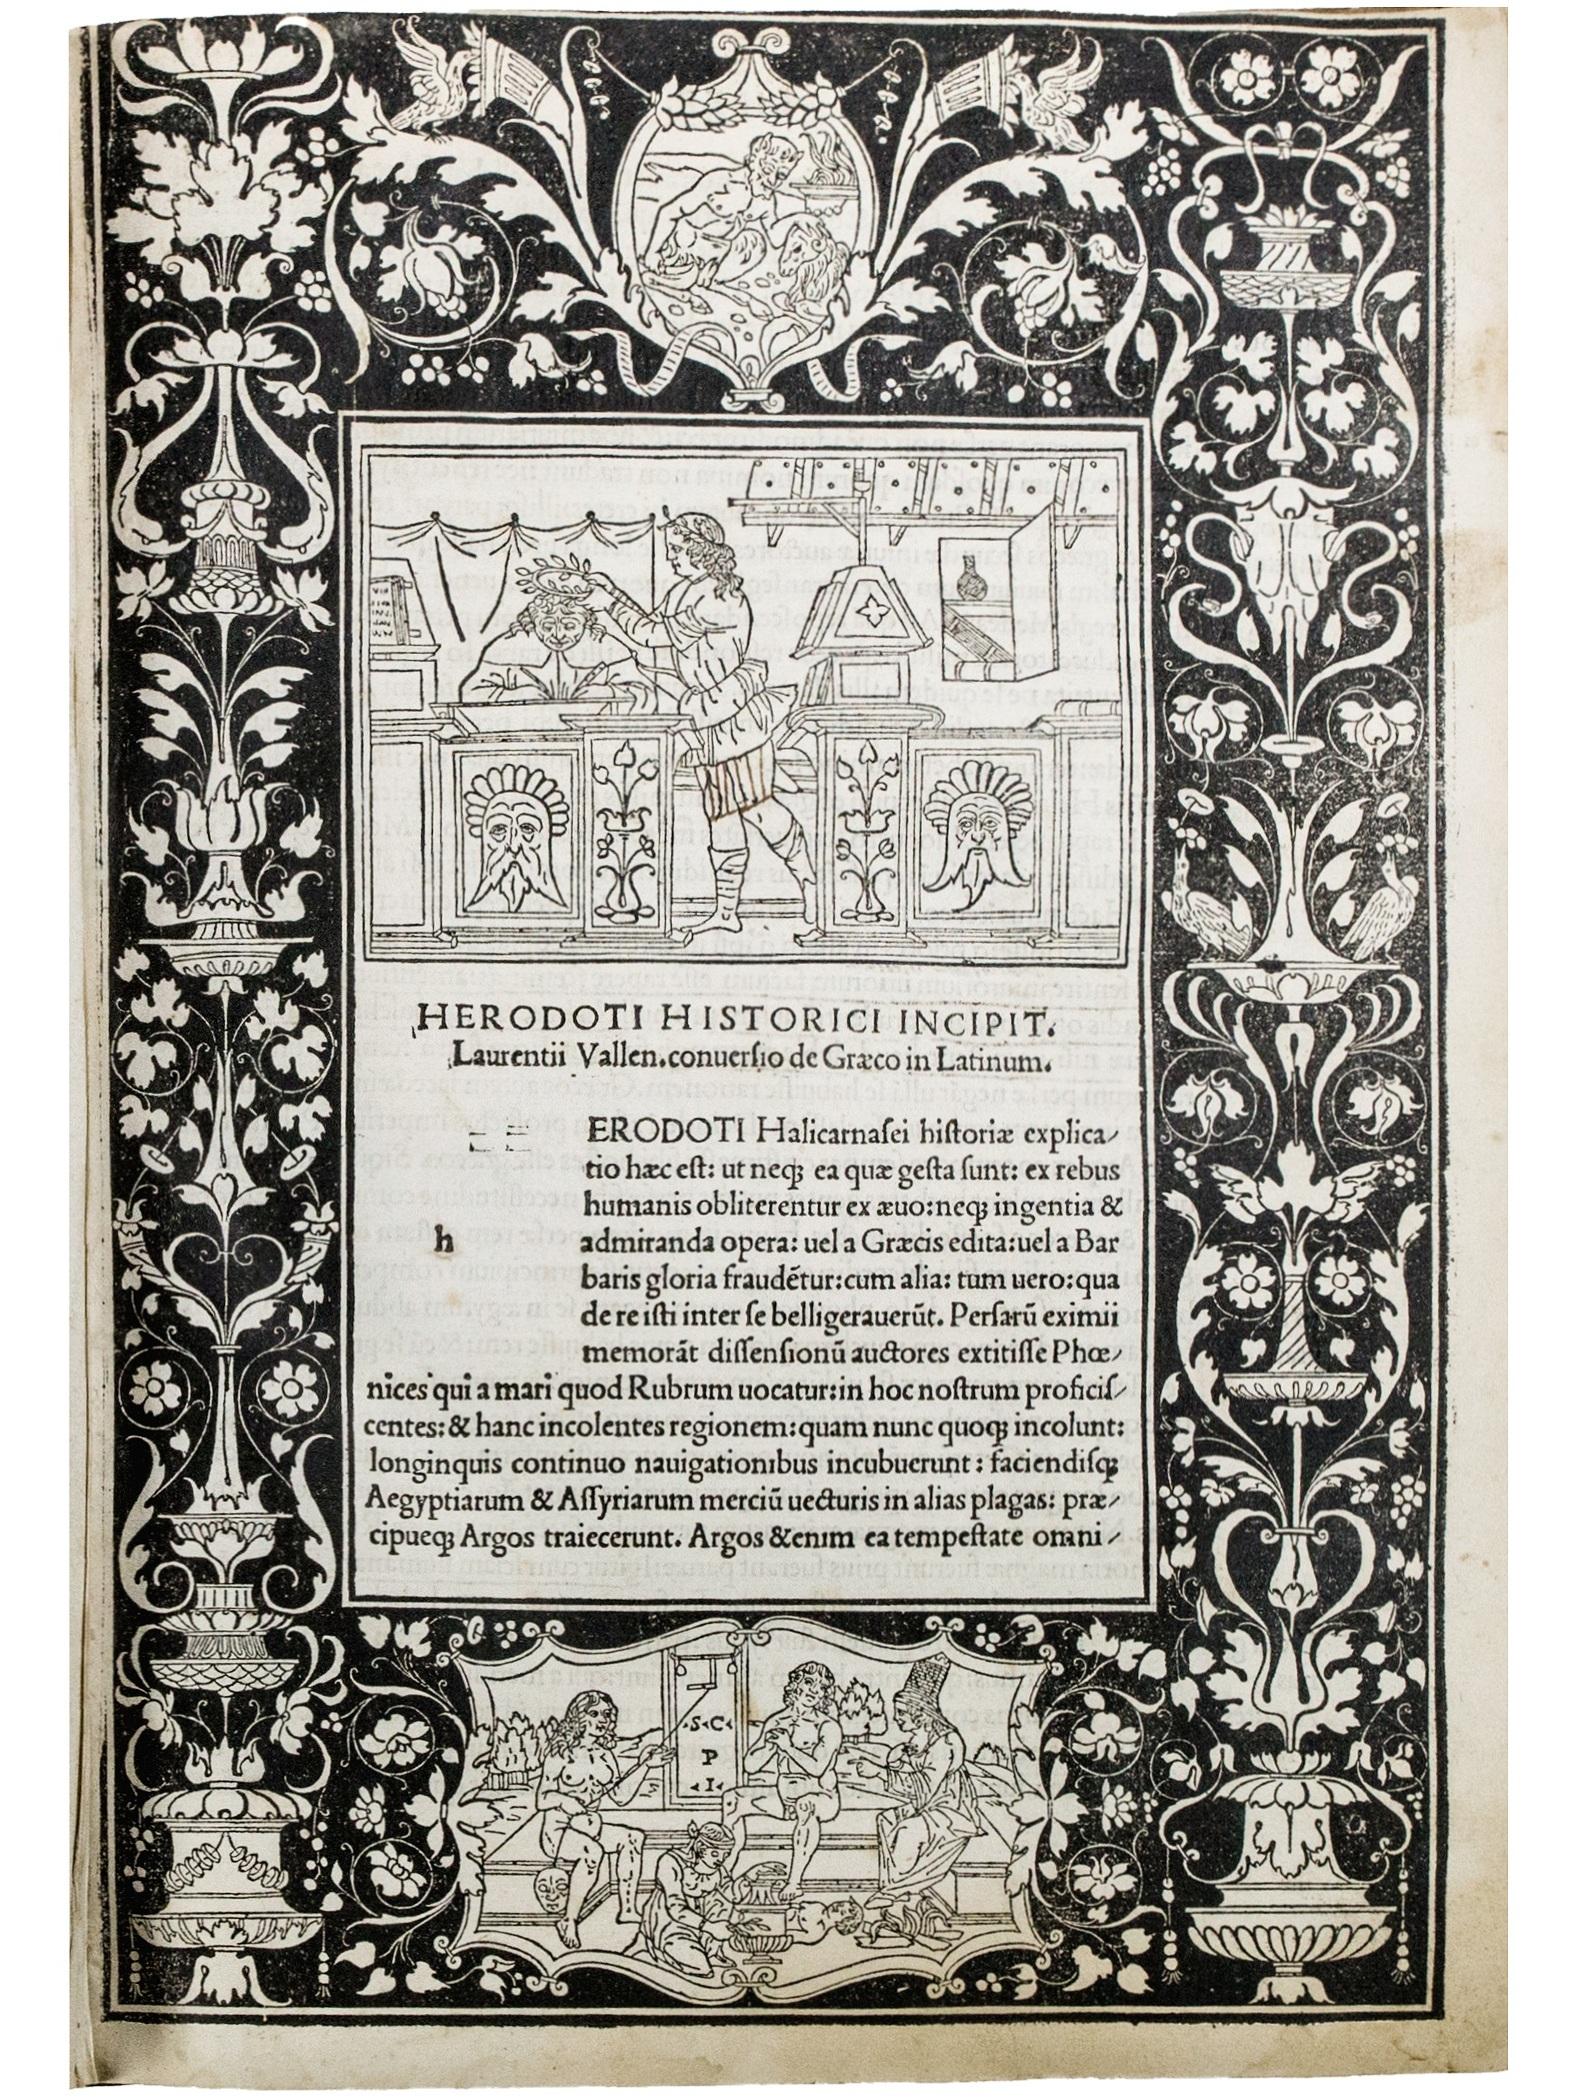 Herodotus (ca. 484–430/20 BC).  Historiae. Tr: Laurentius Valla. Ed: Antonius Mancinellus.  Venice, Johannes and Gregorius de Gregoriis, de Forlivio, 8 March [actually not before 30 March] 1494.